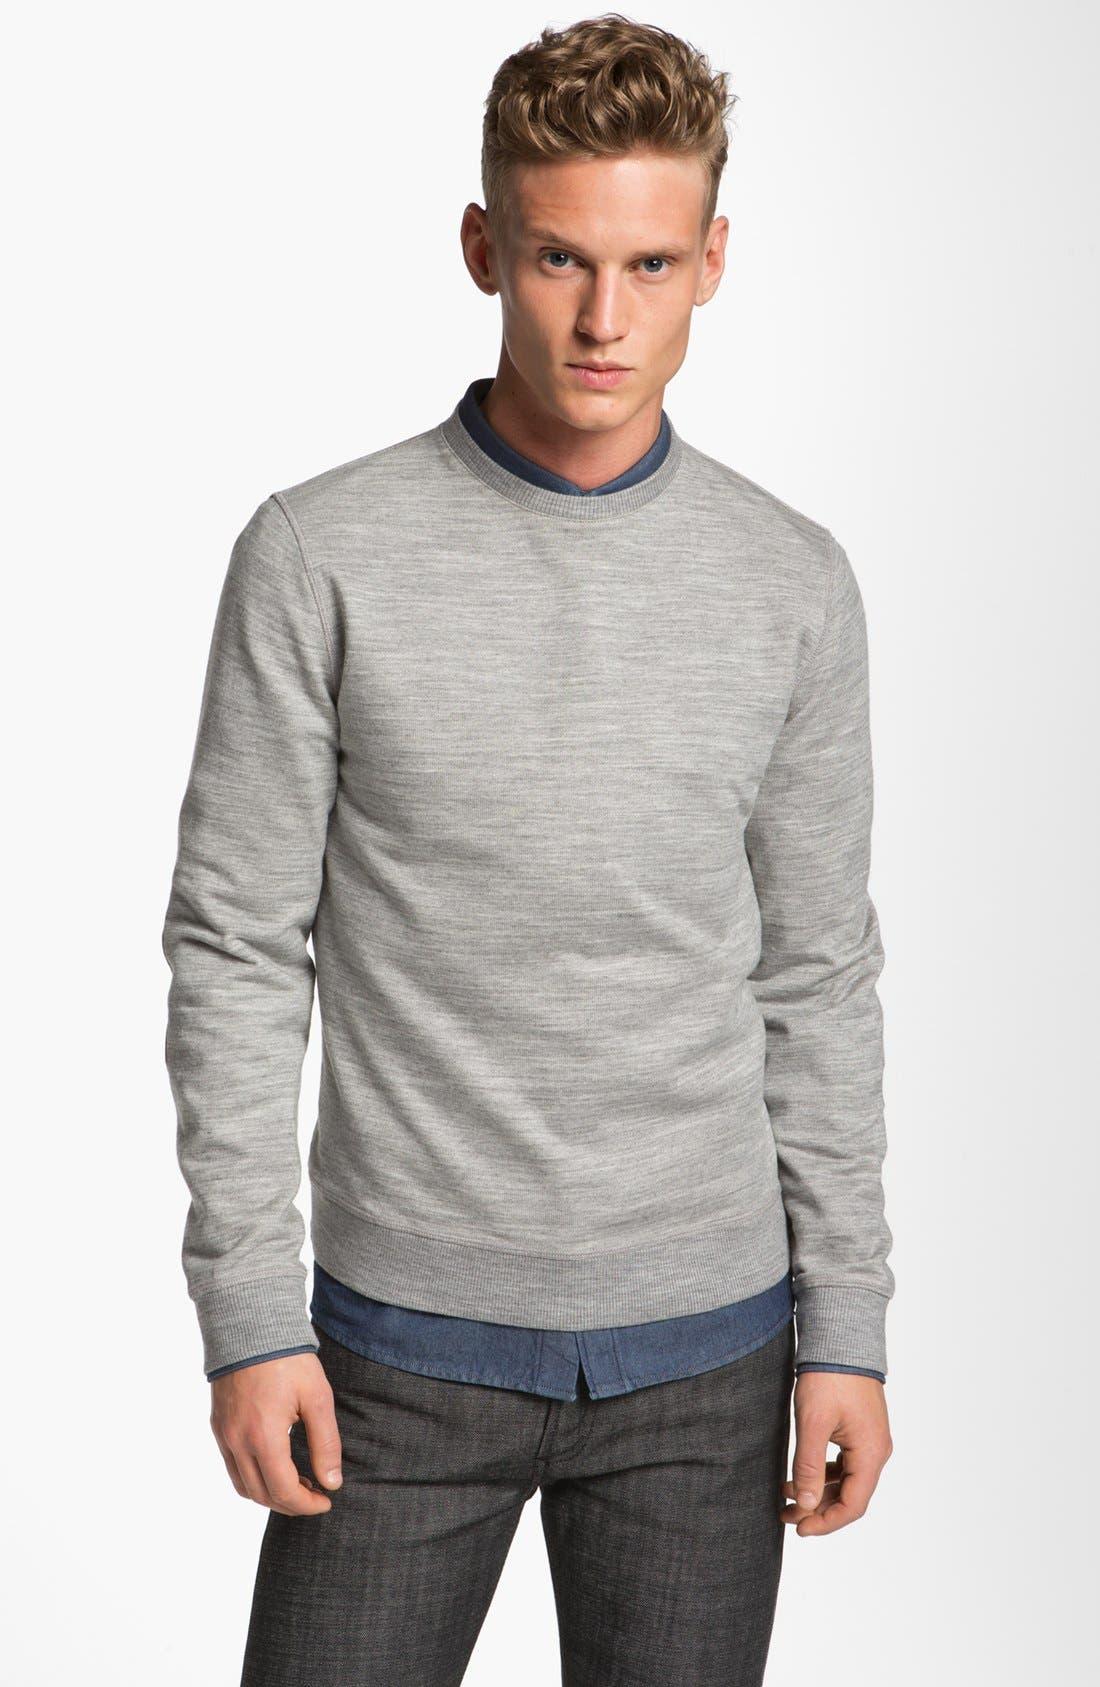 Main Image - A.P.C. Crewneck Sweatshirt